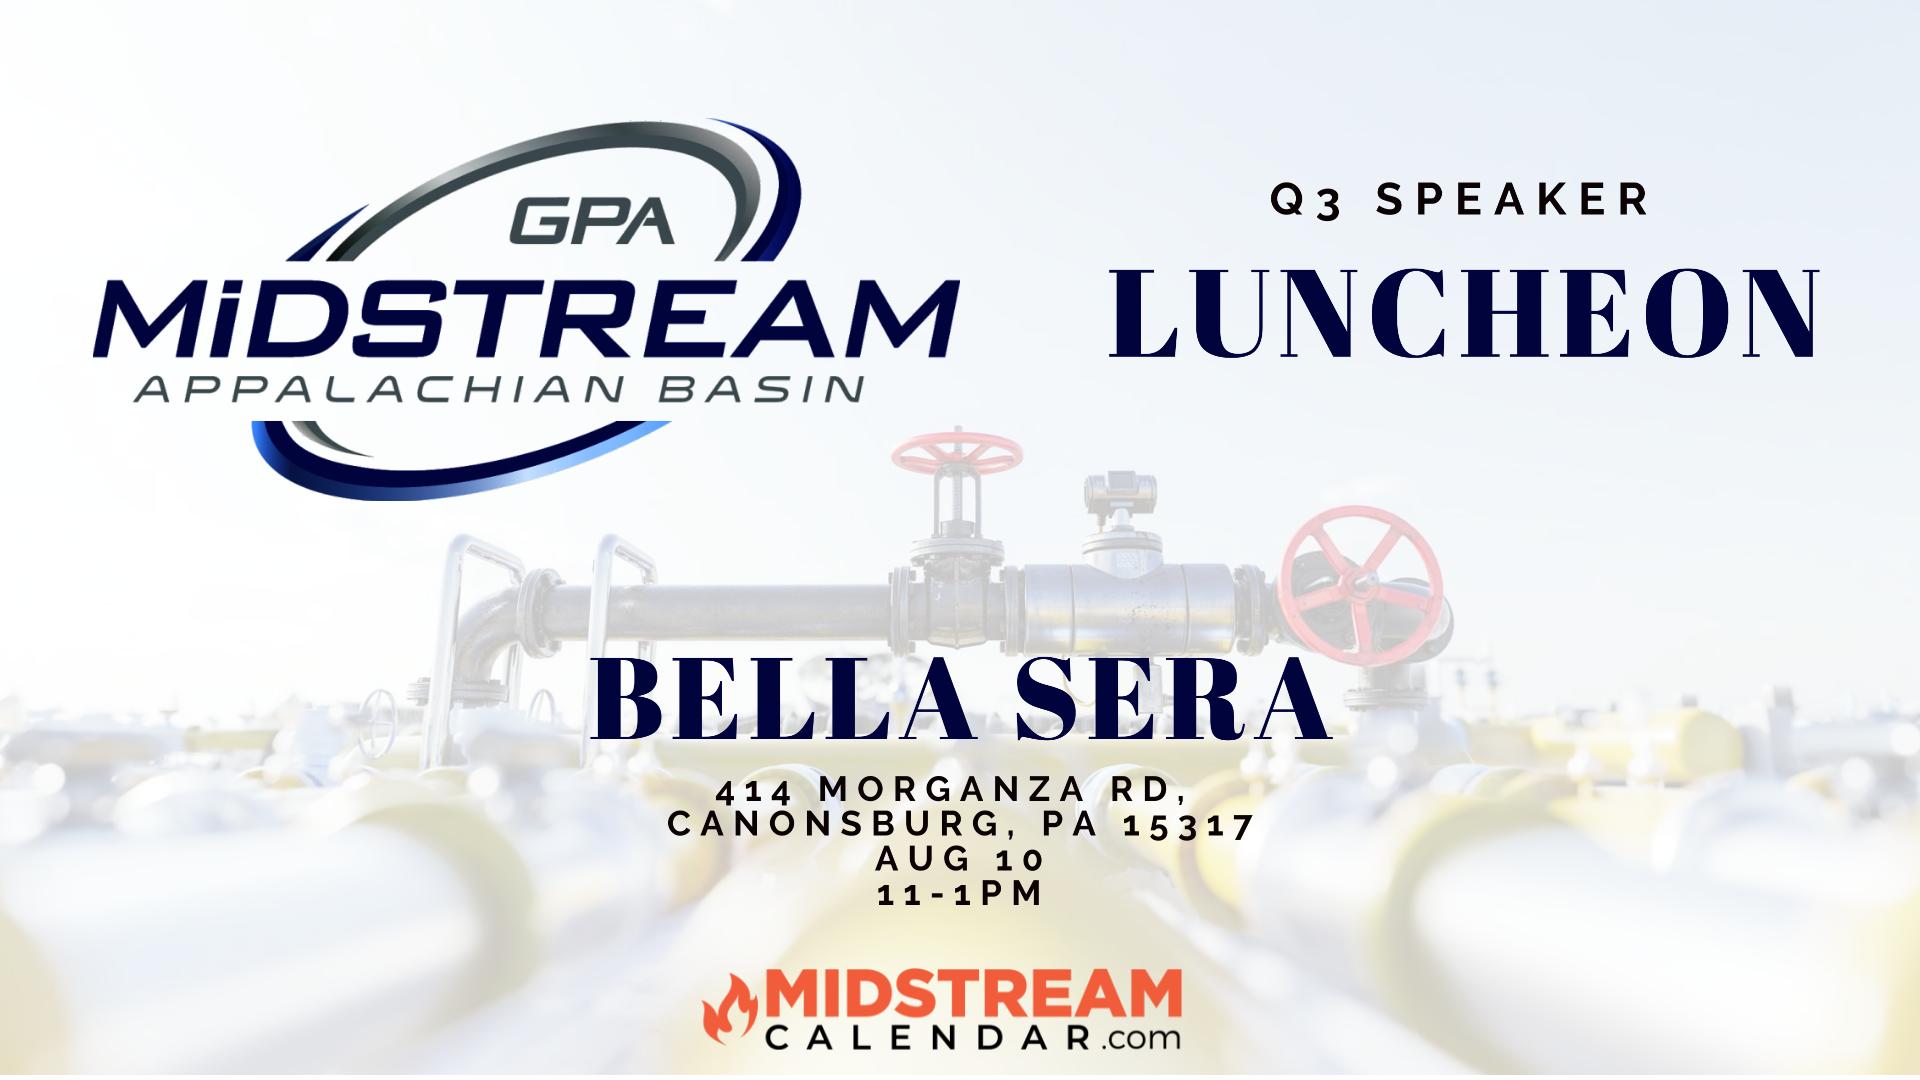 GPA Midstream Appalachian Basin Midstream Calendar